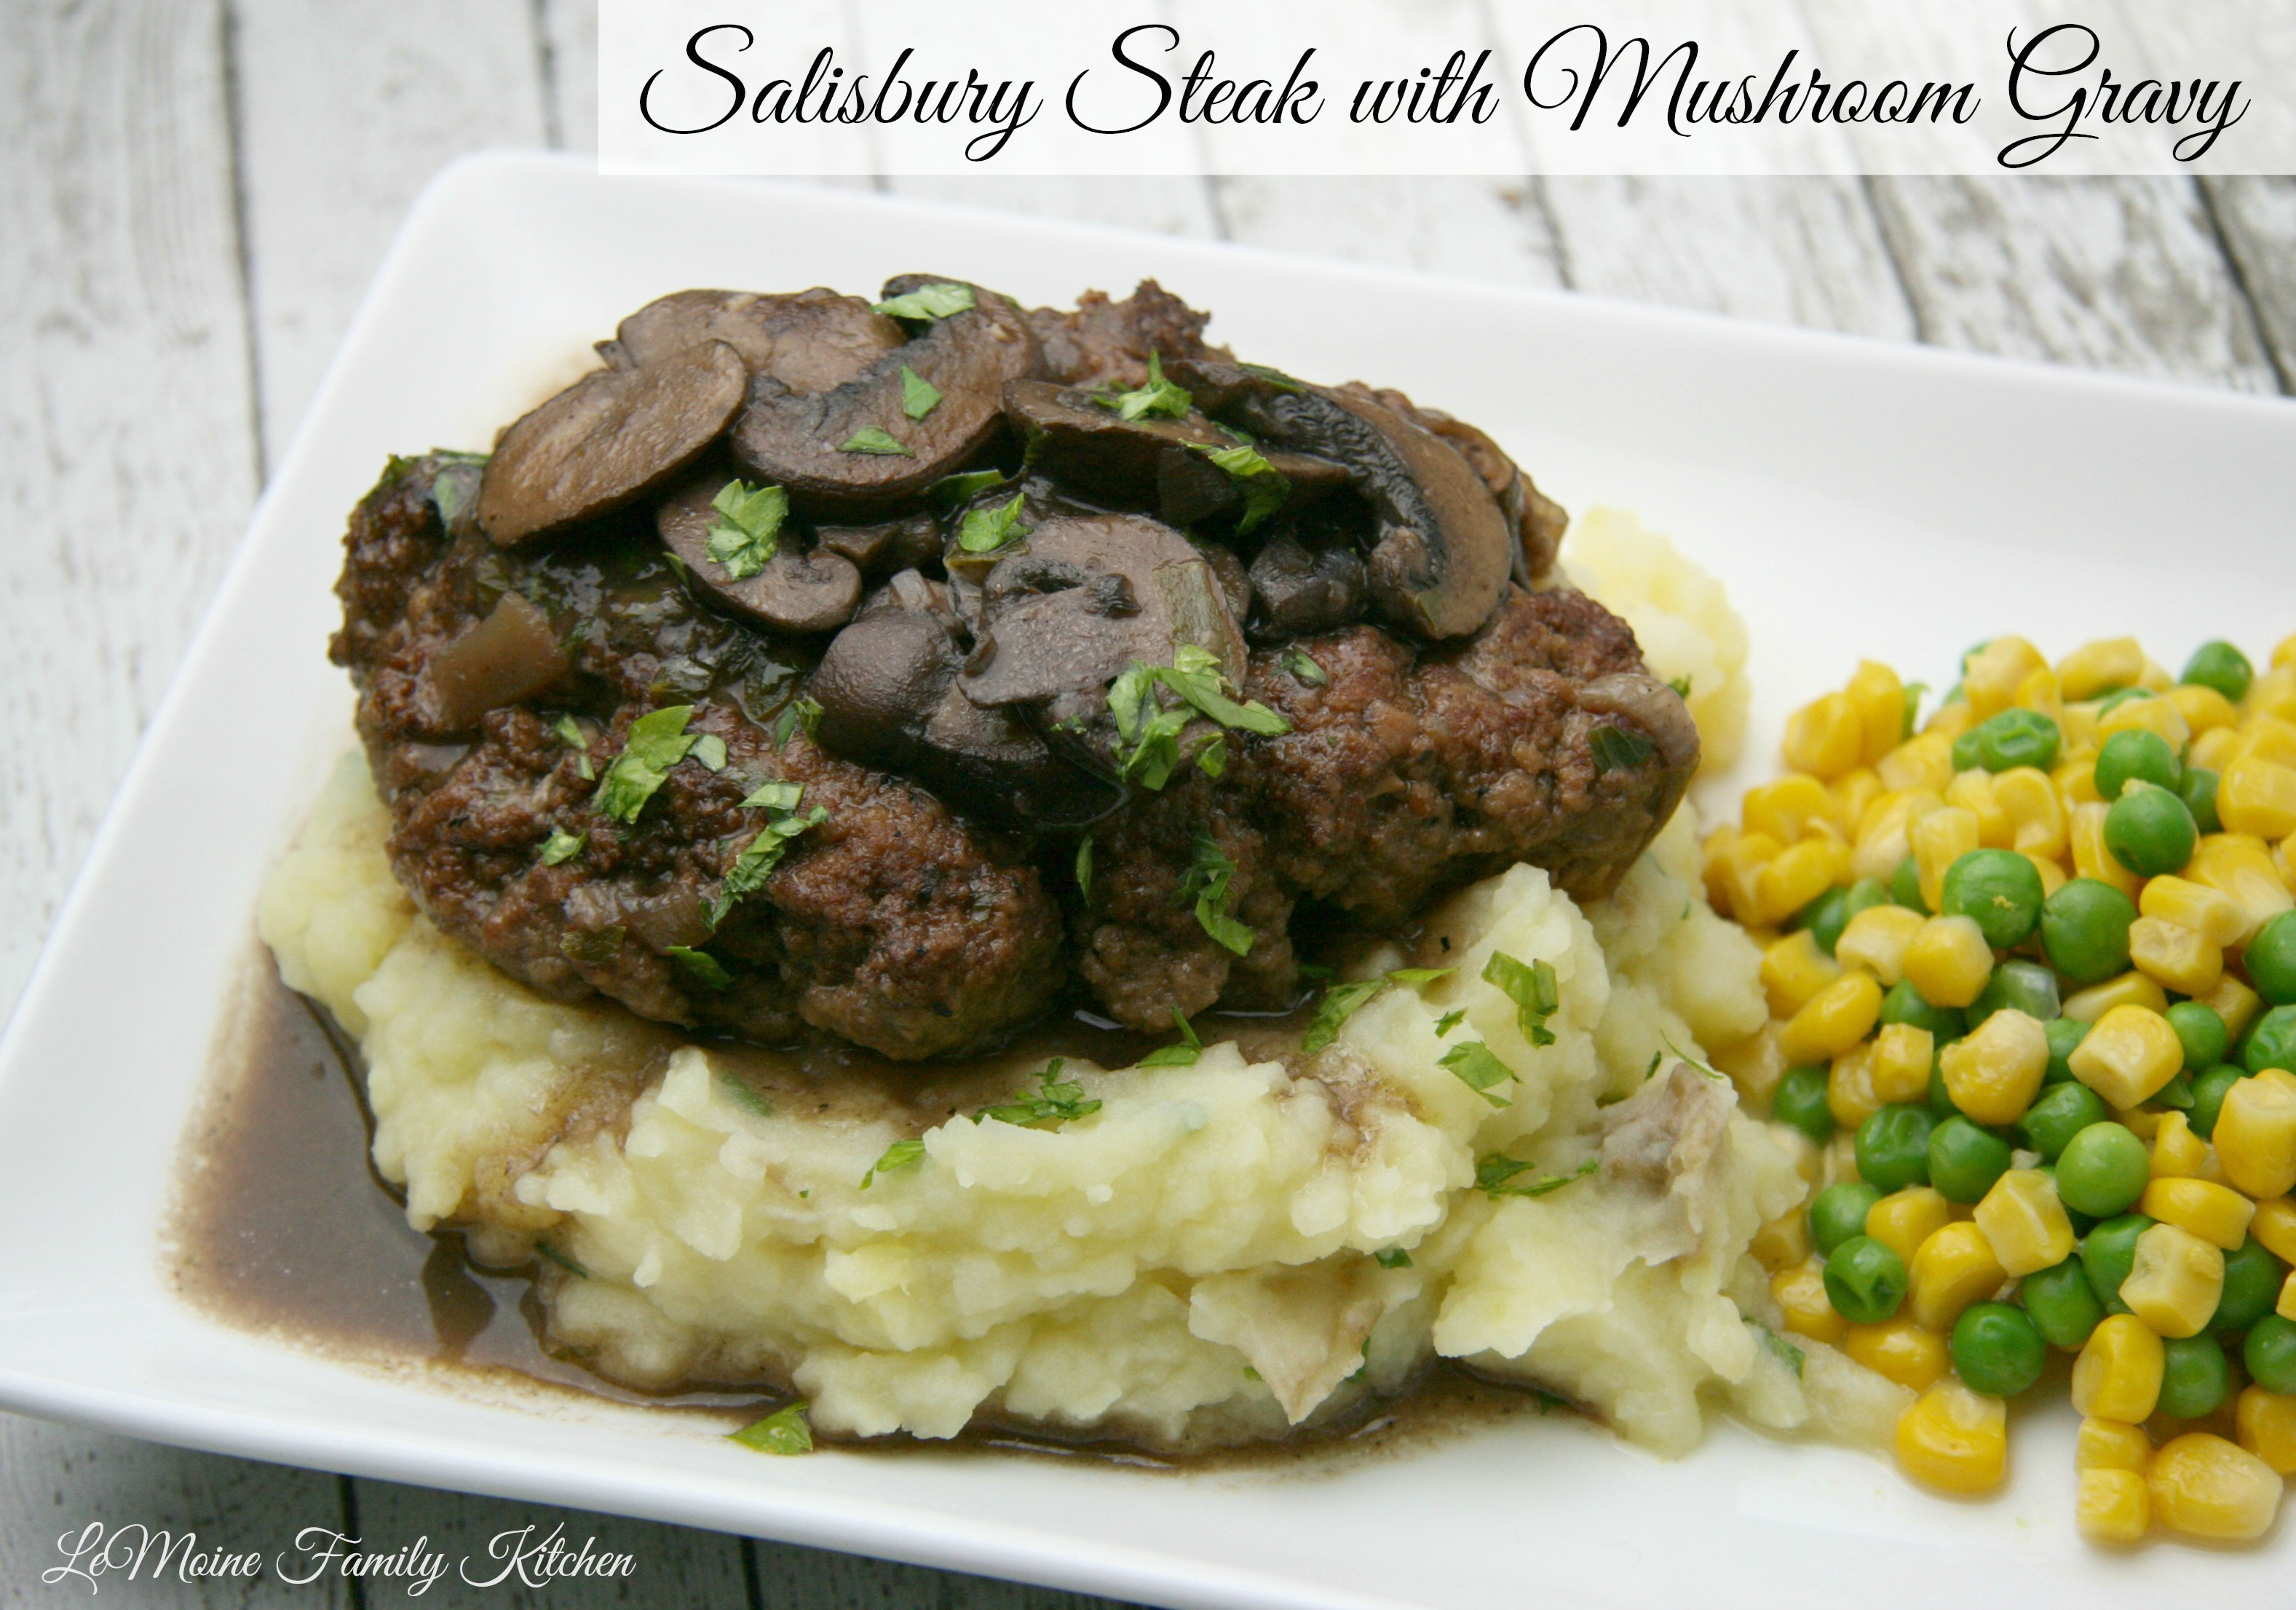 Salisbury Steak | LeMoine Family Kitchen #beef #easy #mushroom #gravy #groundbeef #recipe #pork #veal #onepotmeal #nostalgic food